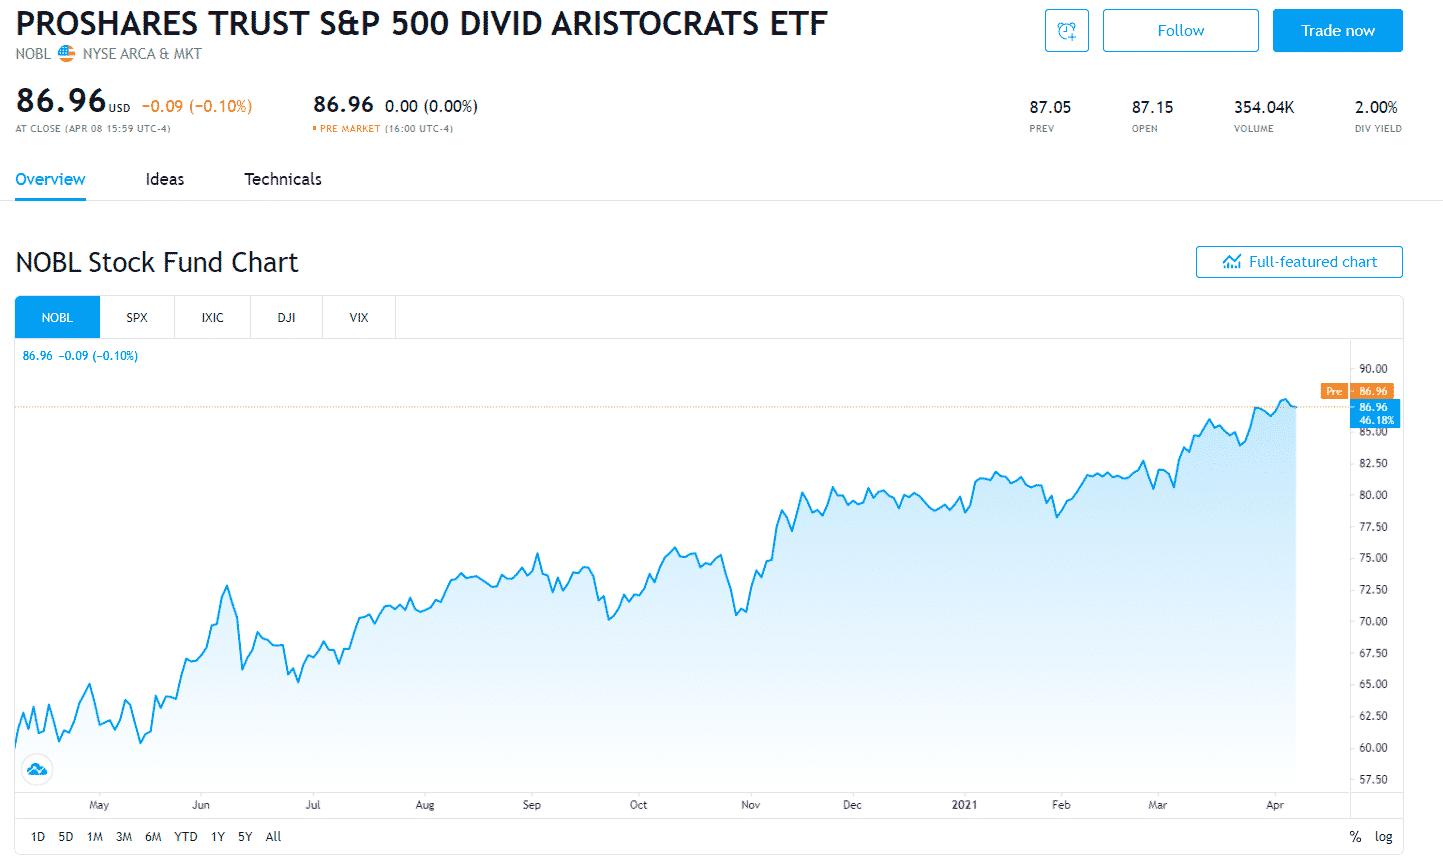 ETF ProShares S&P 500 Aristocrats (NOBL)